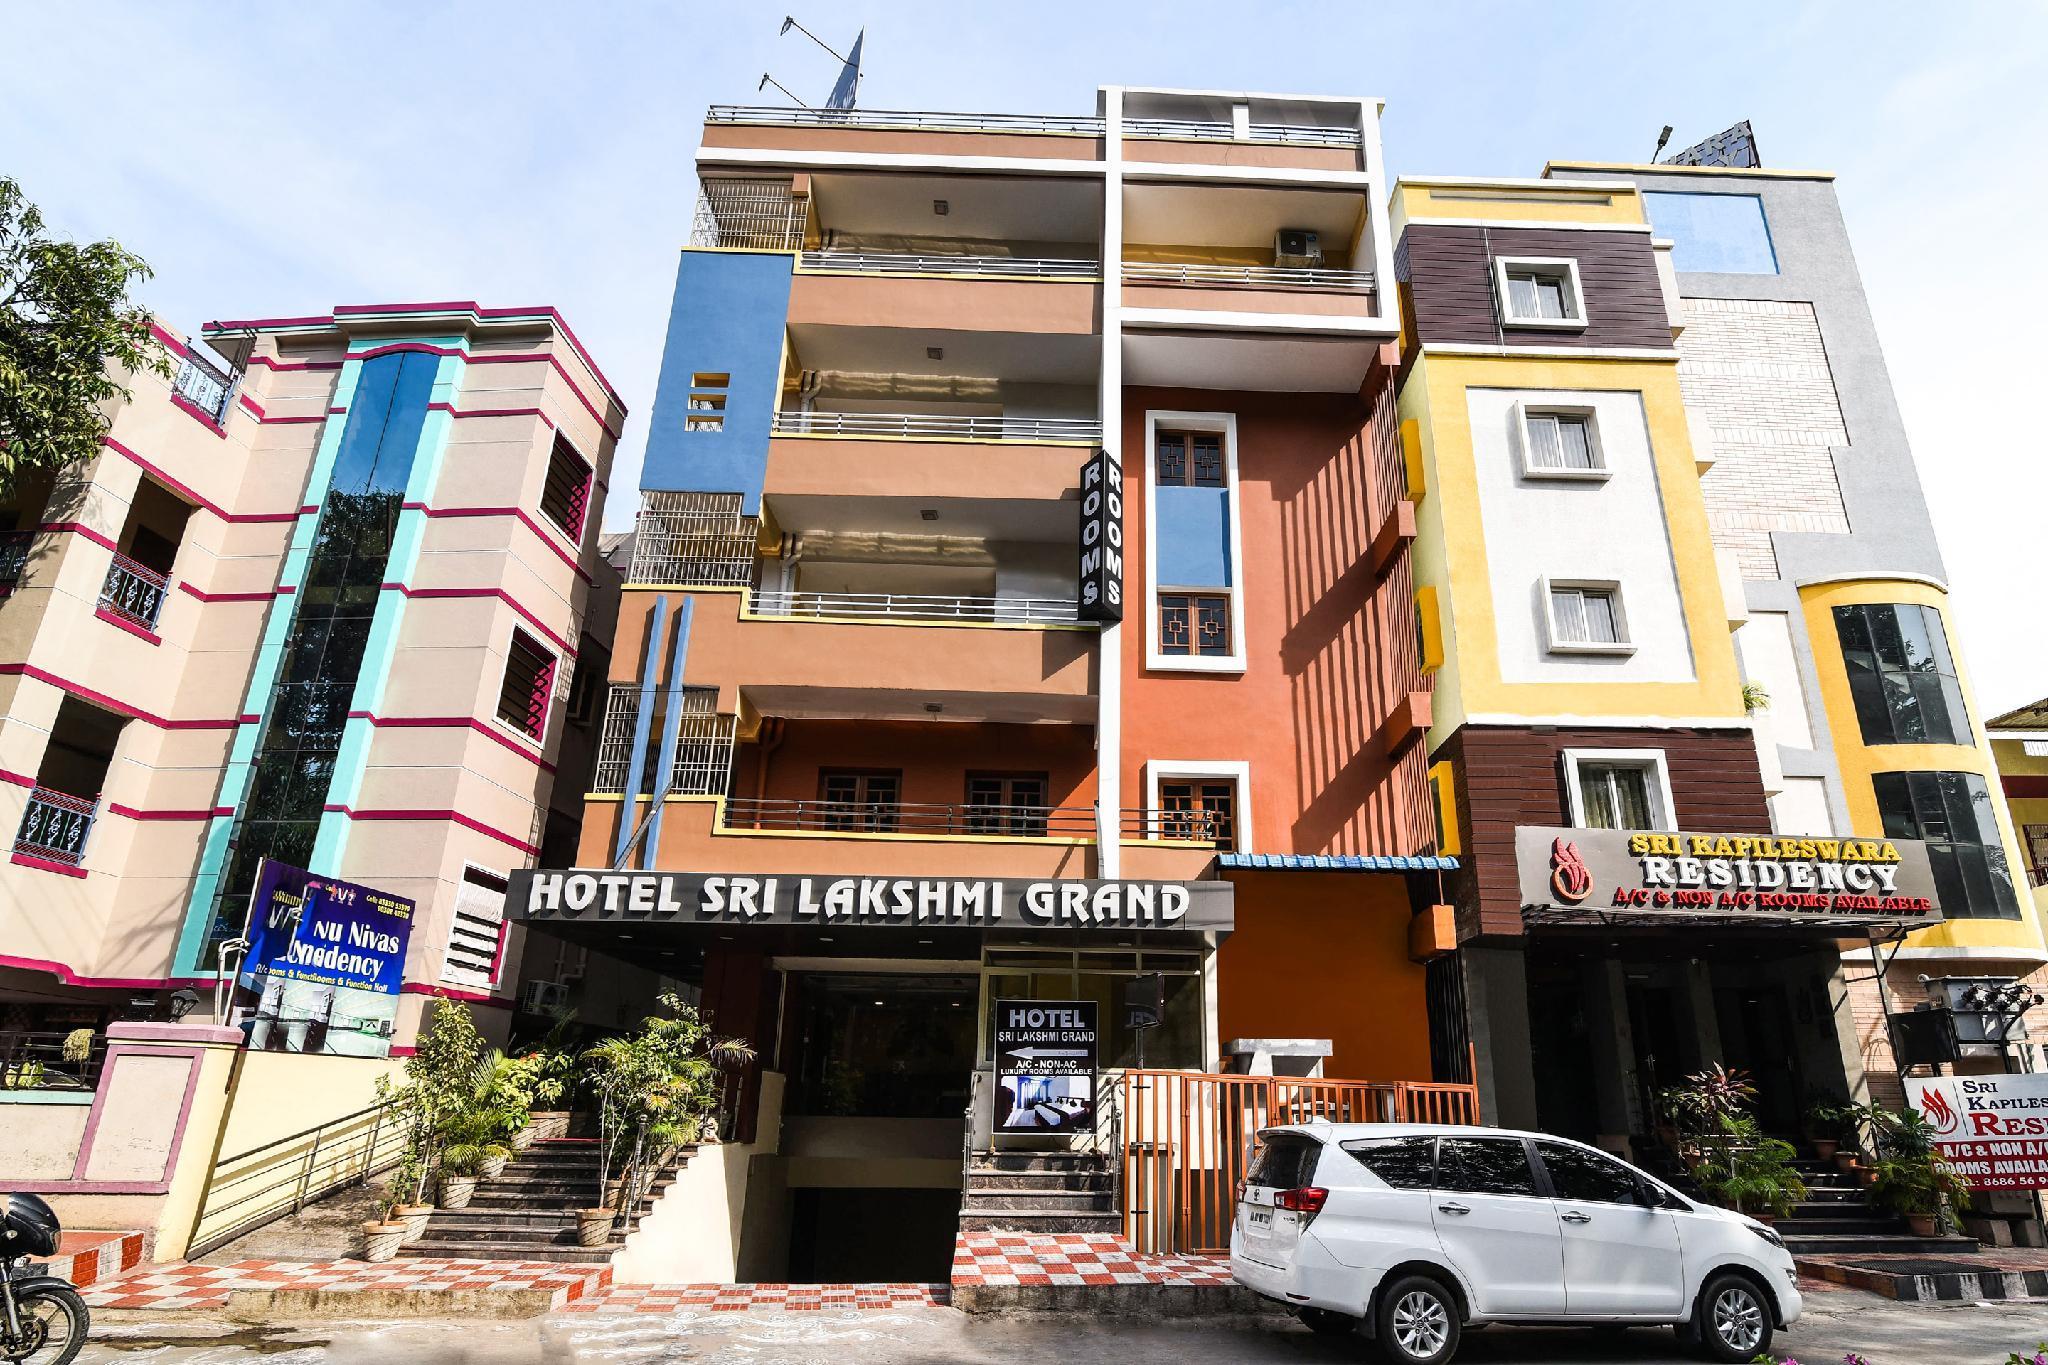 Capital O 37901 Hotel Sri Lakshmi Grand